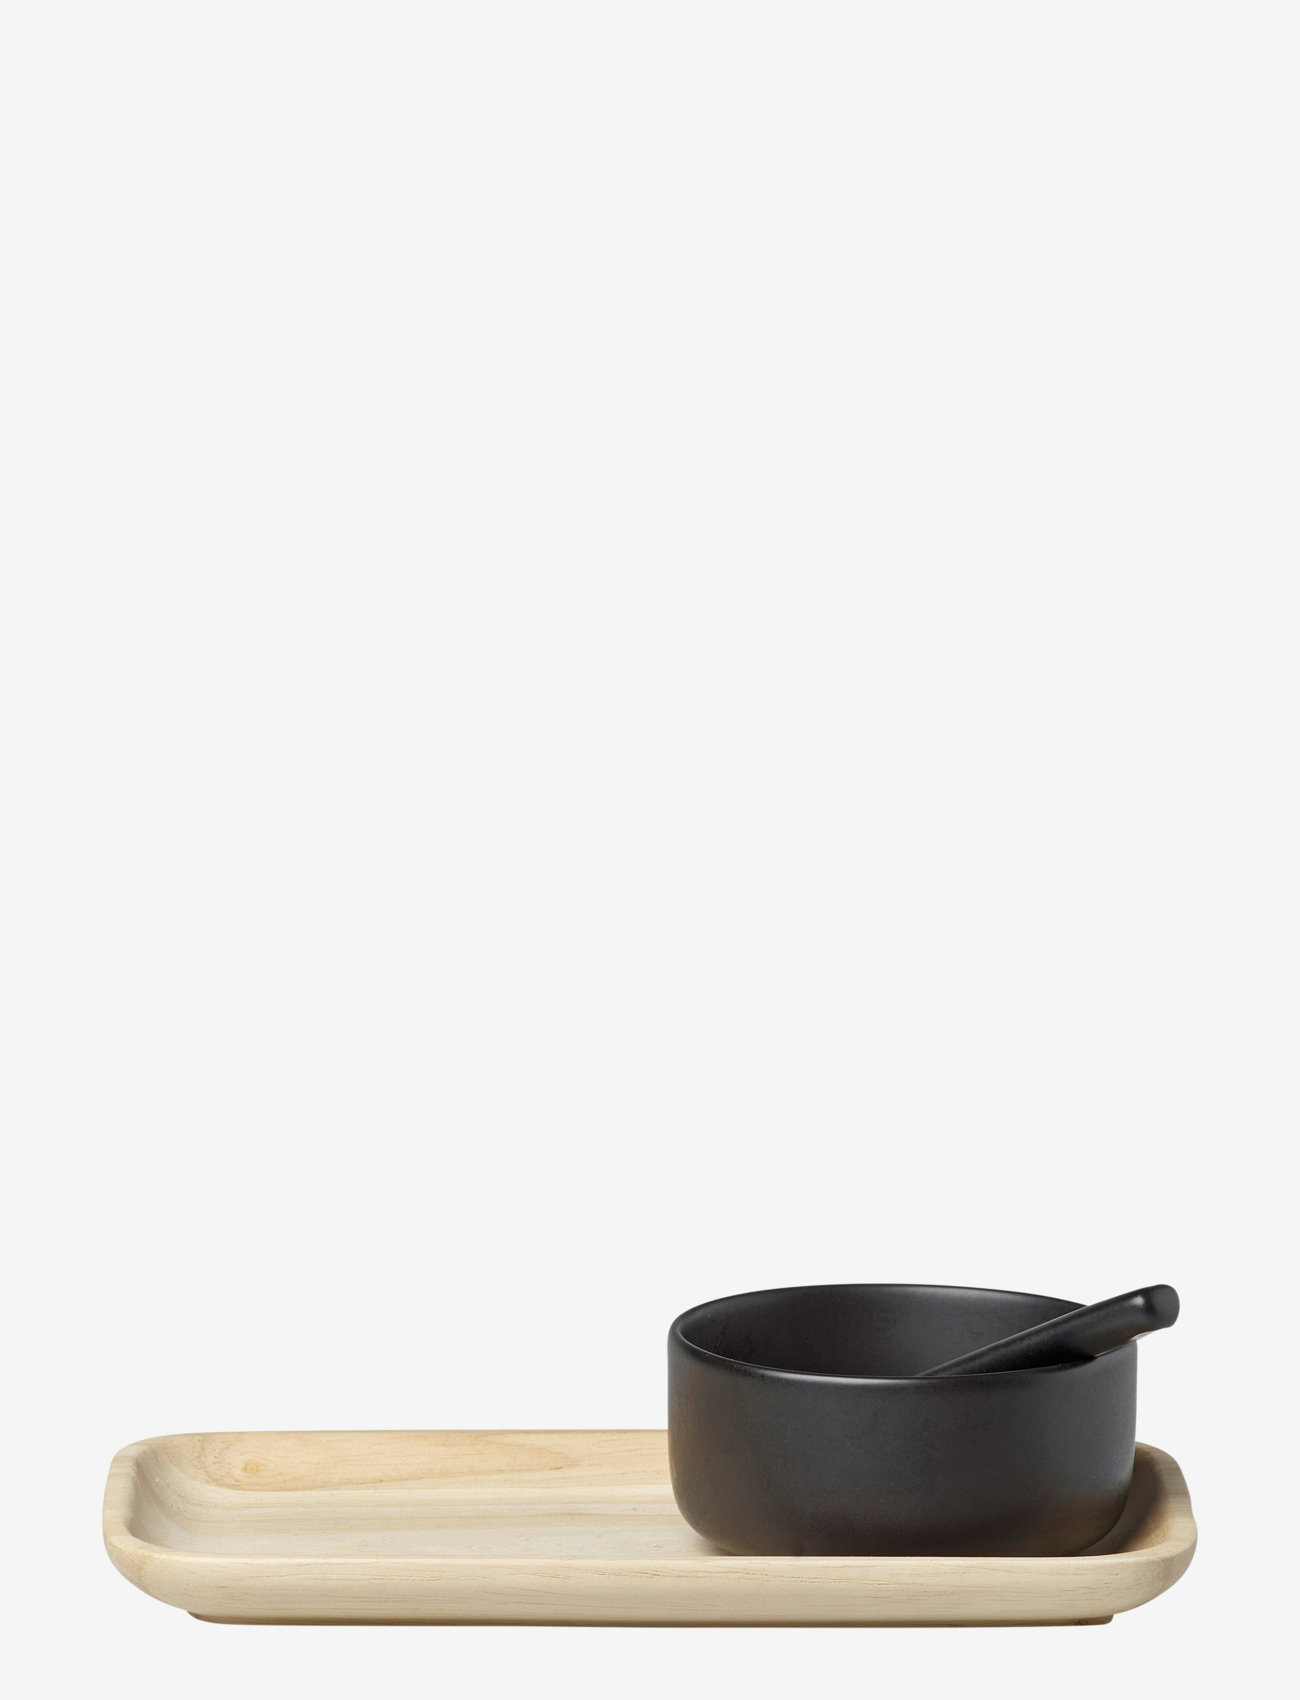 Marimekko Home - OIVA / SPICE SET - krydderikværne - matt black, brown - 0